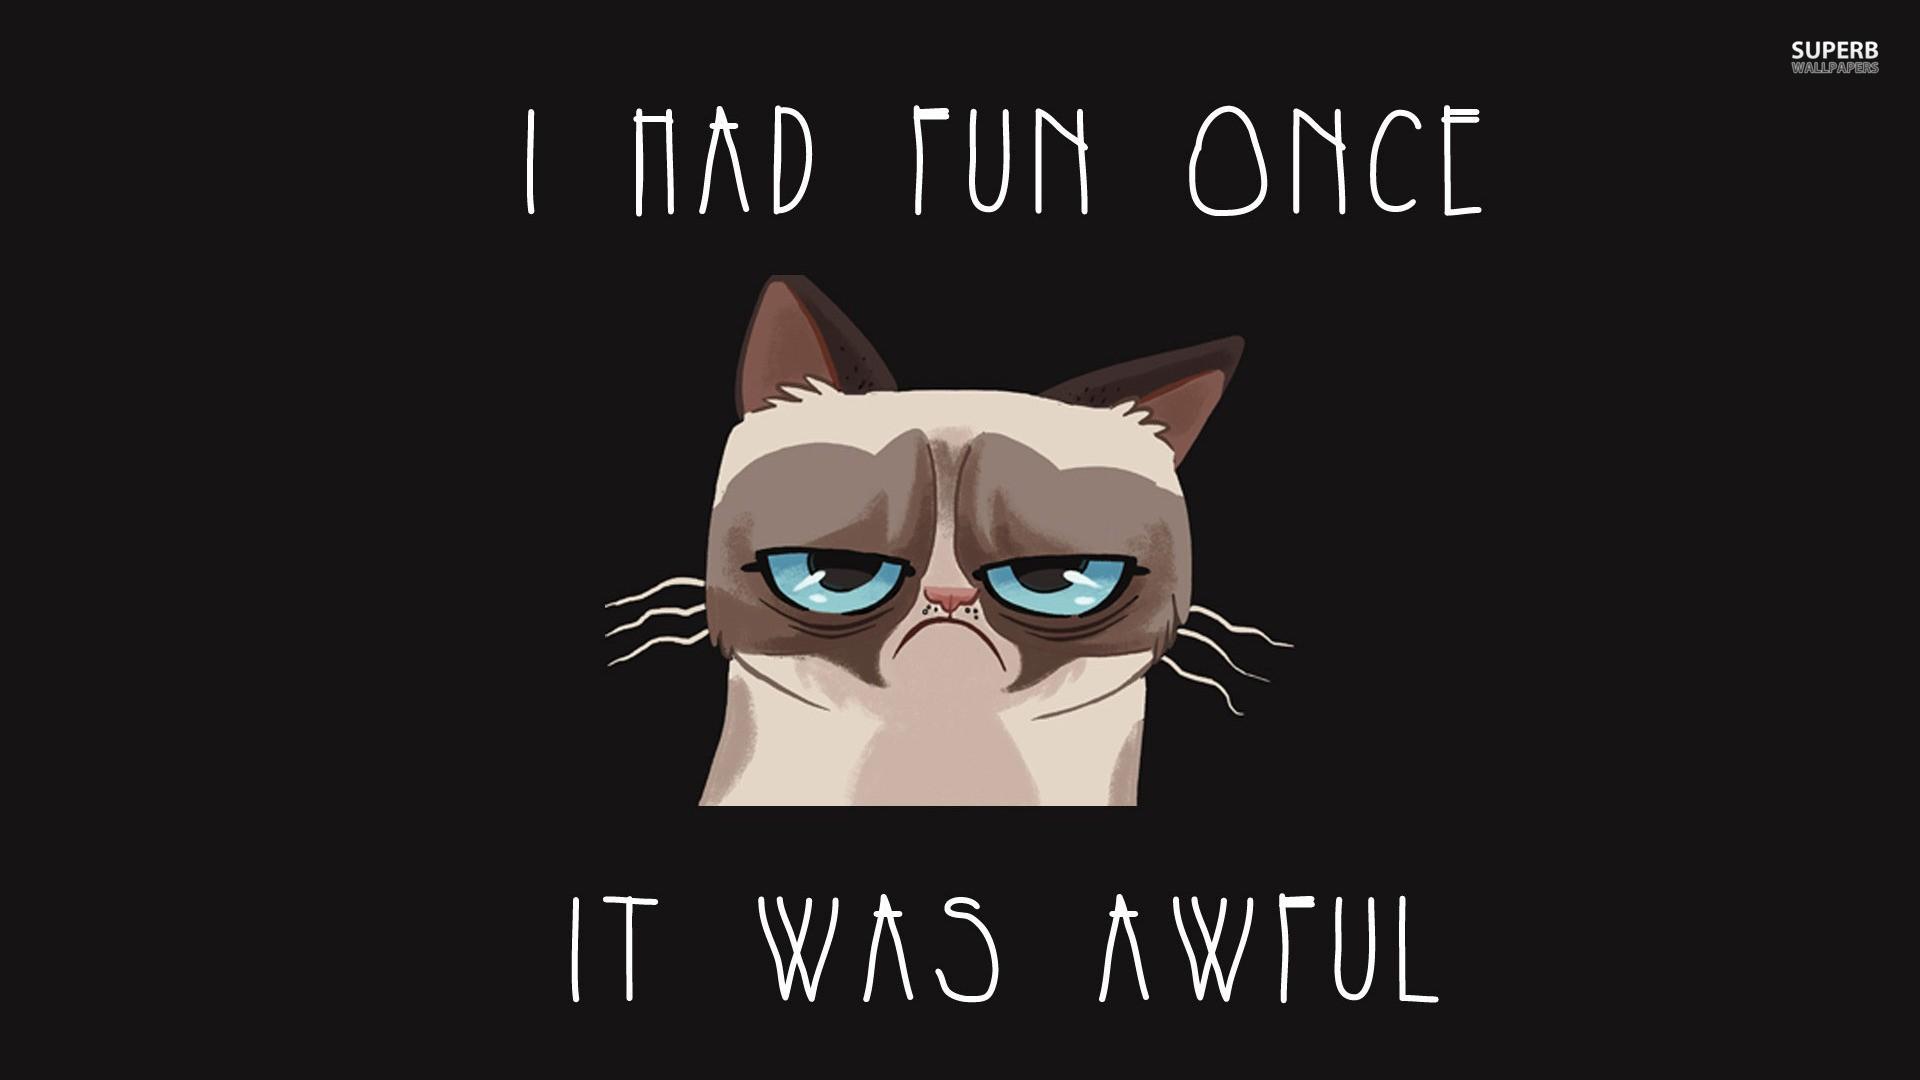 Grumpy cat once had fun 1920x1080